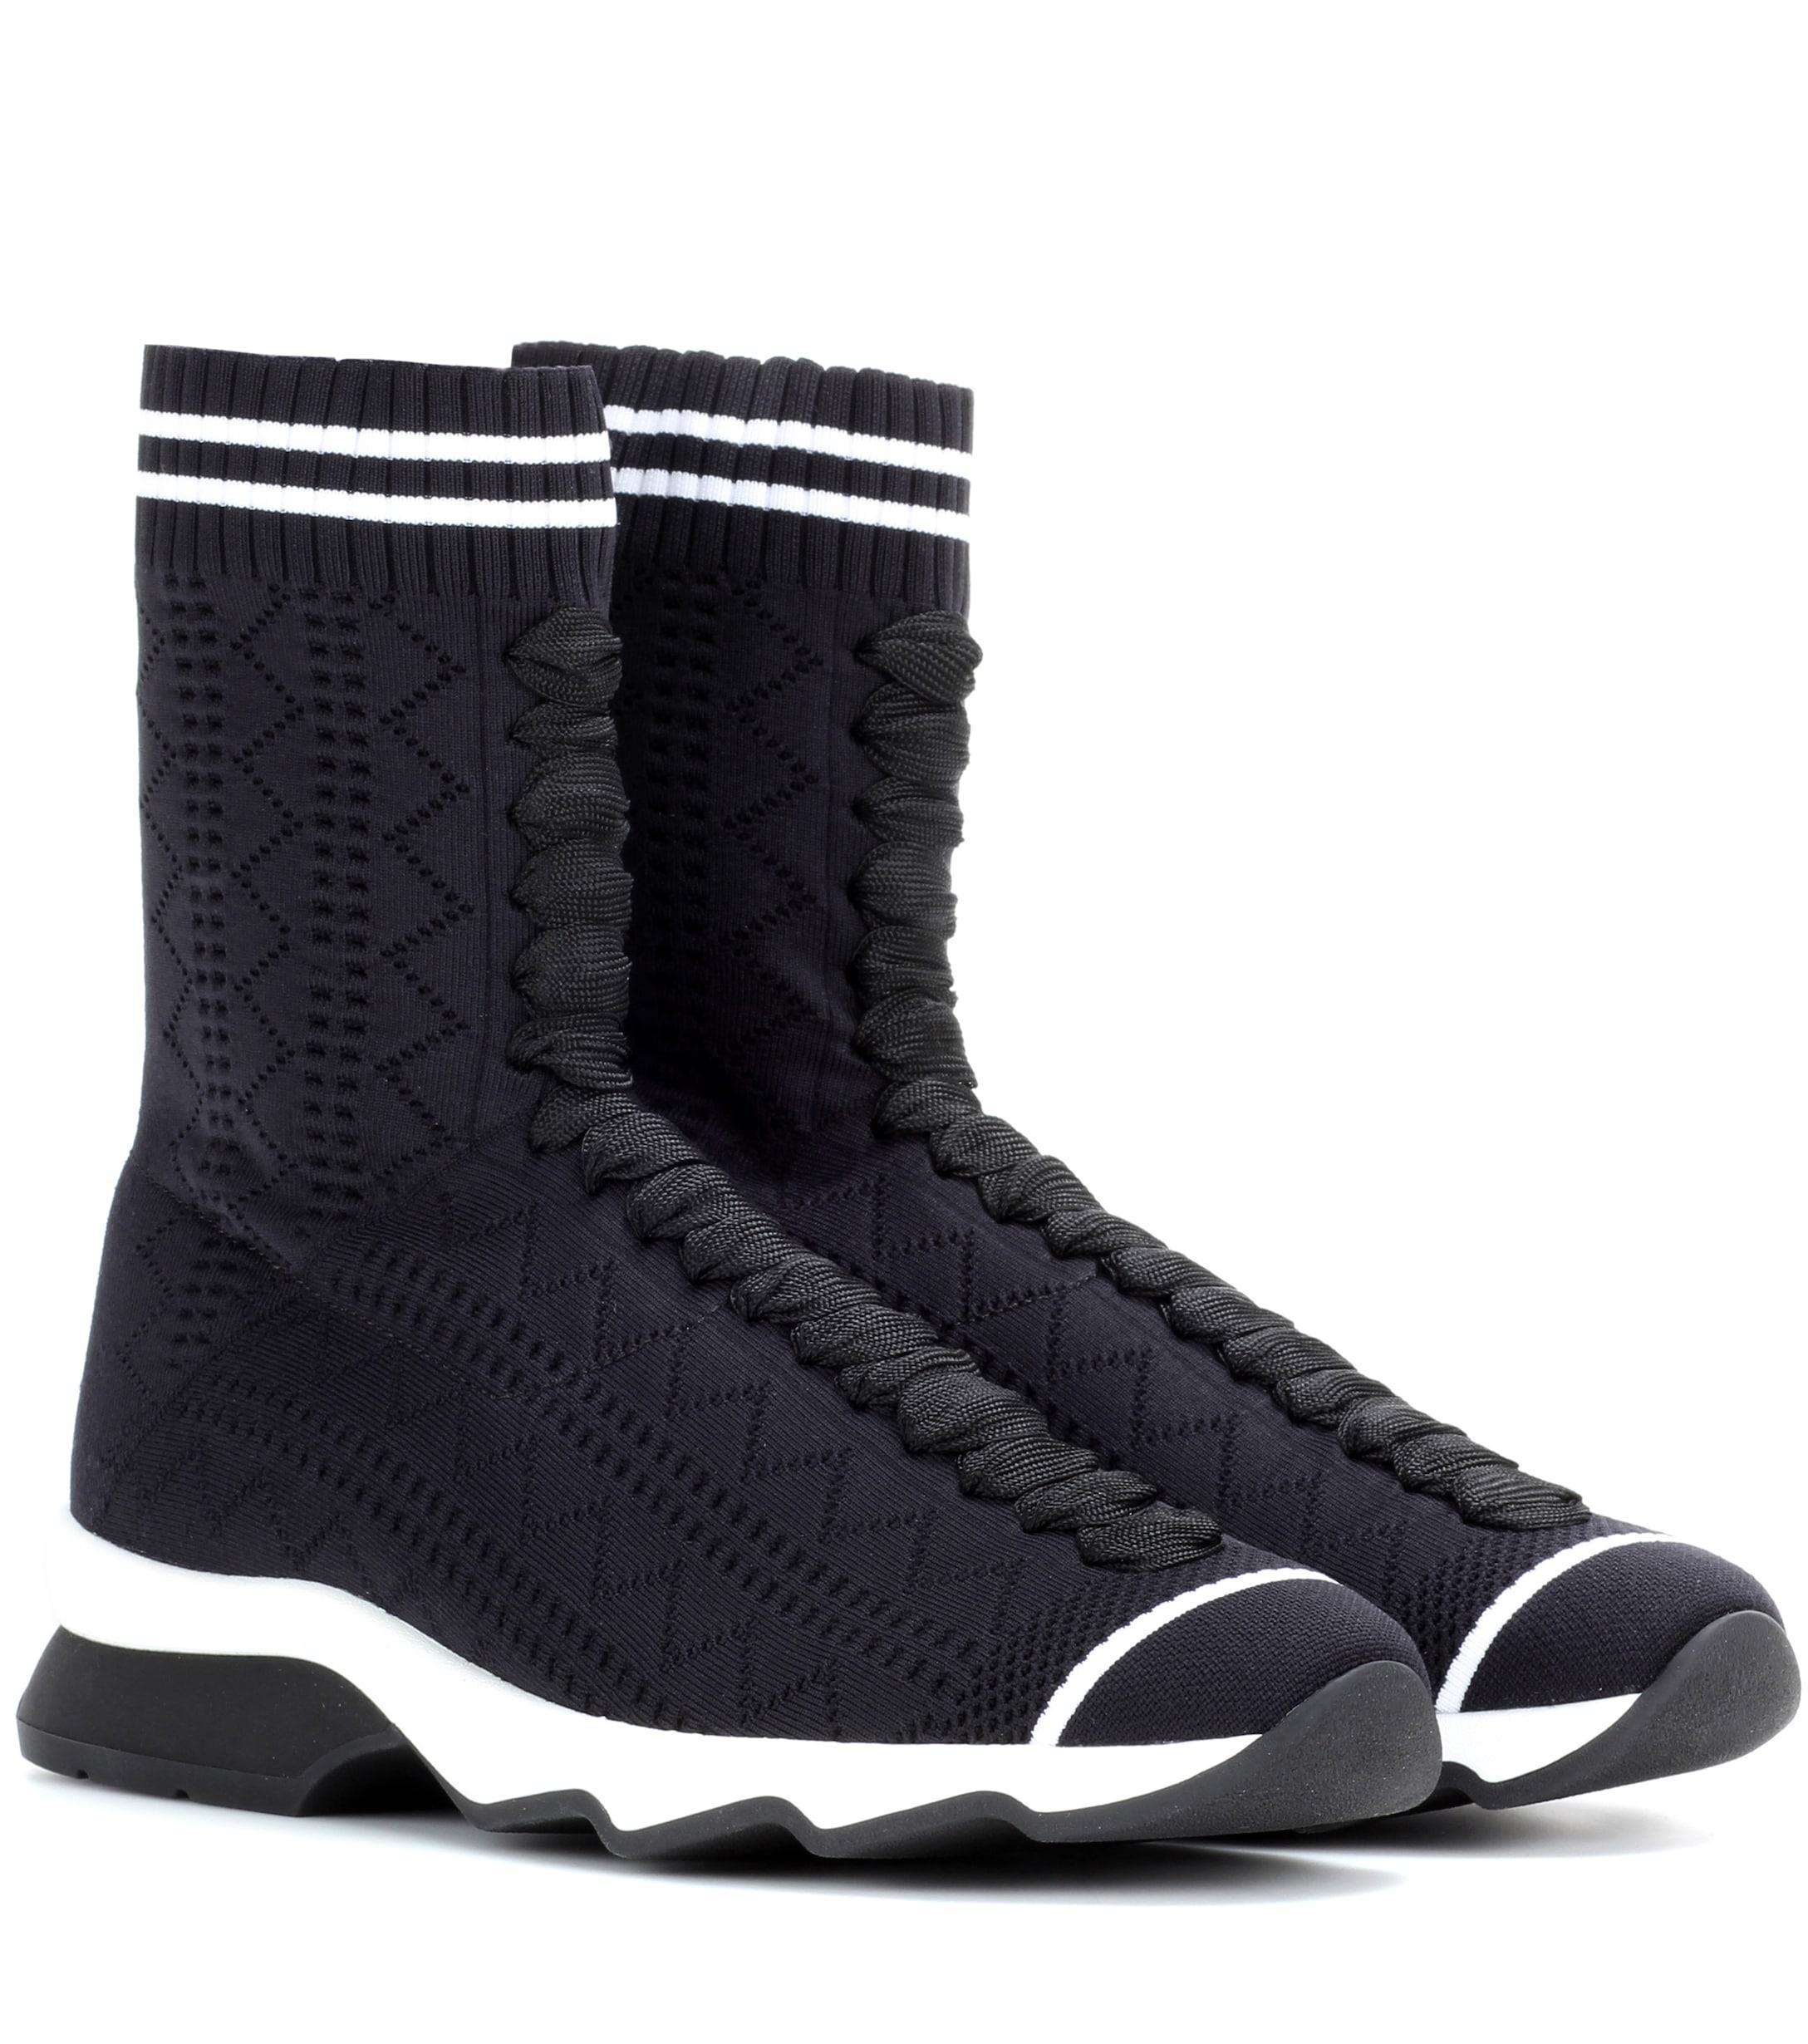 544ff3b689 Lyst - Fendi High-top Sneakers in Black